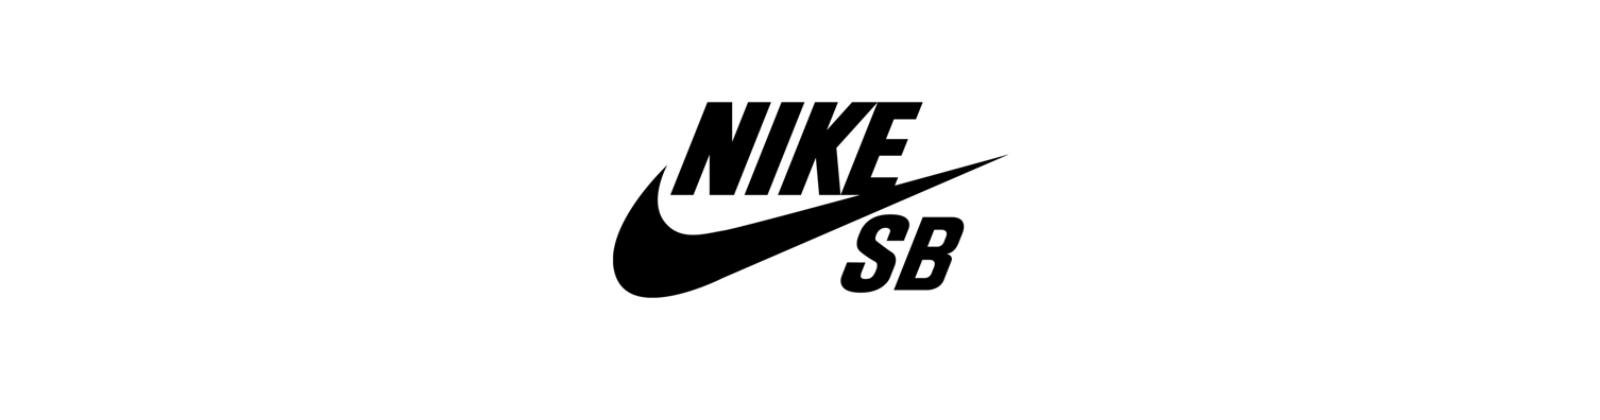 Girls Skate Nike